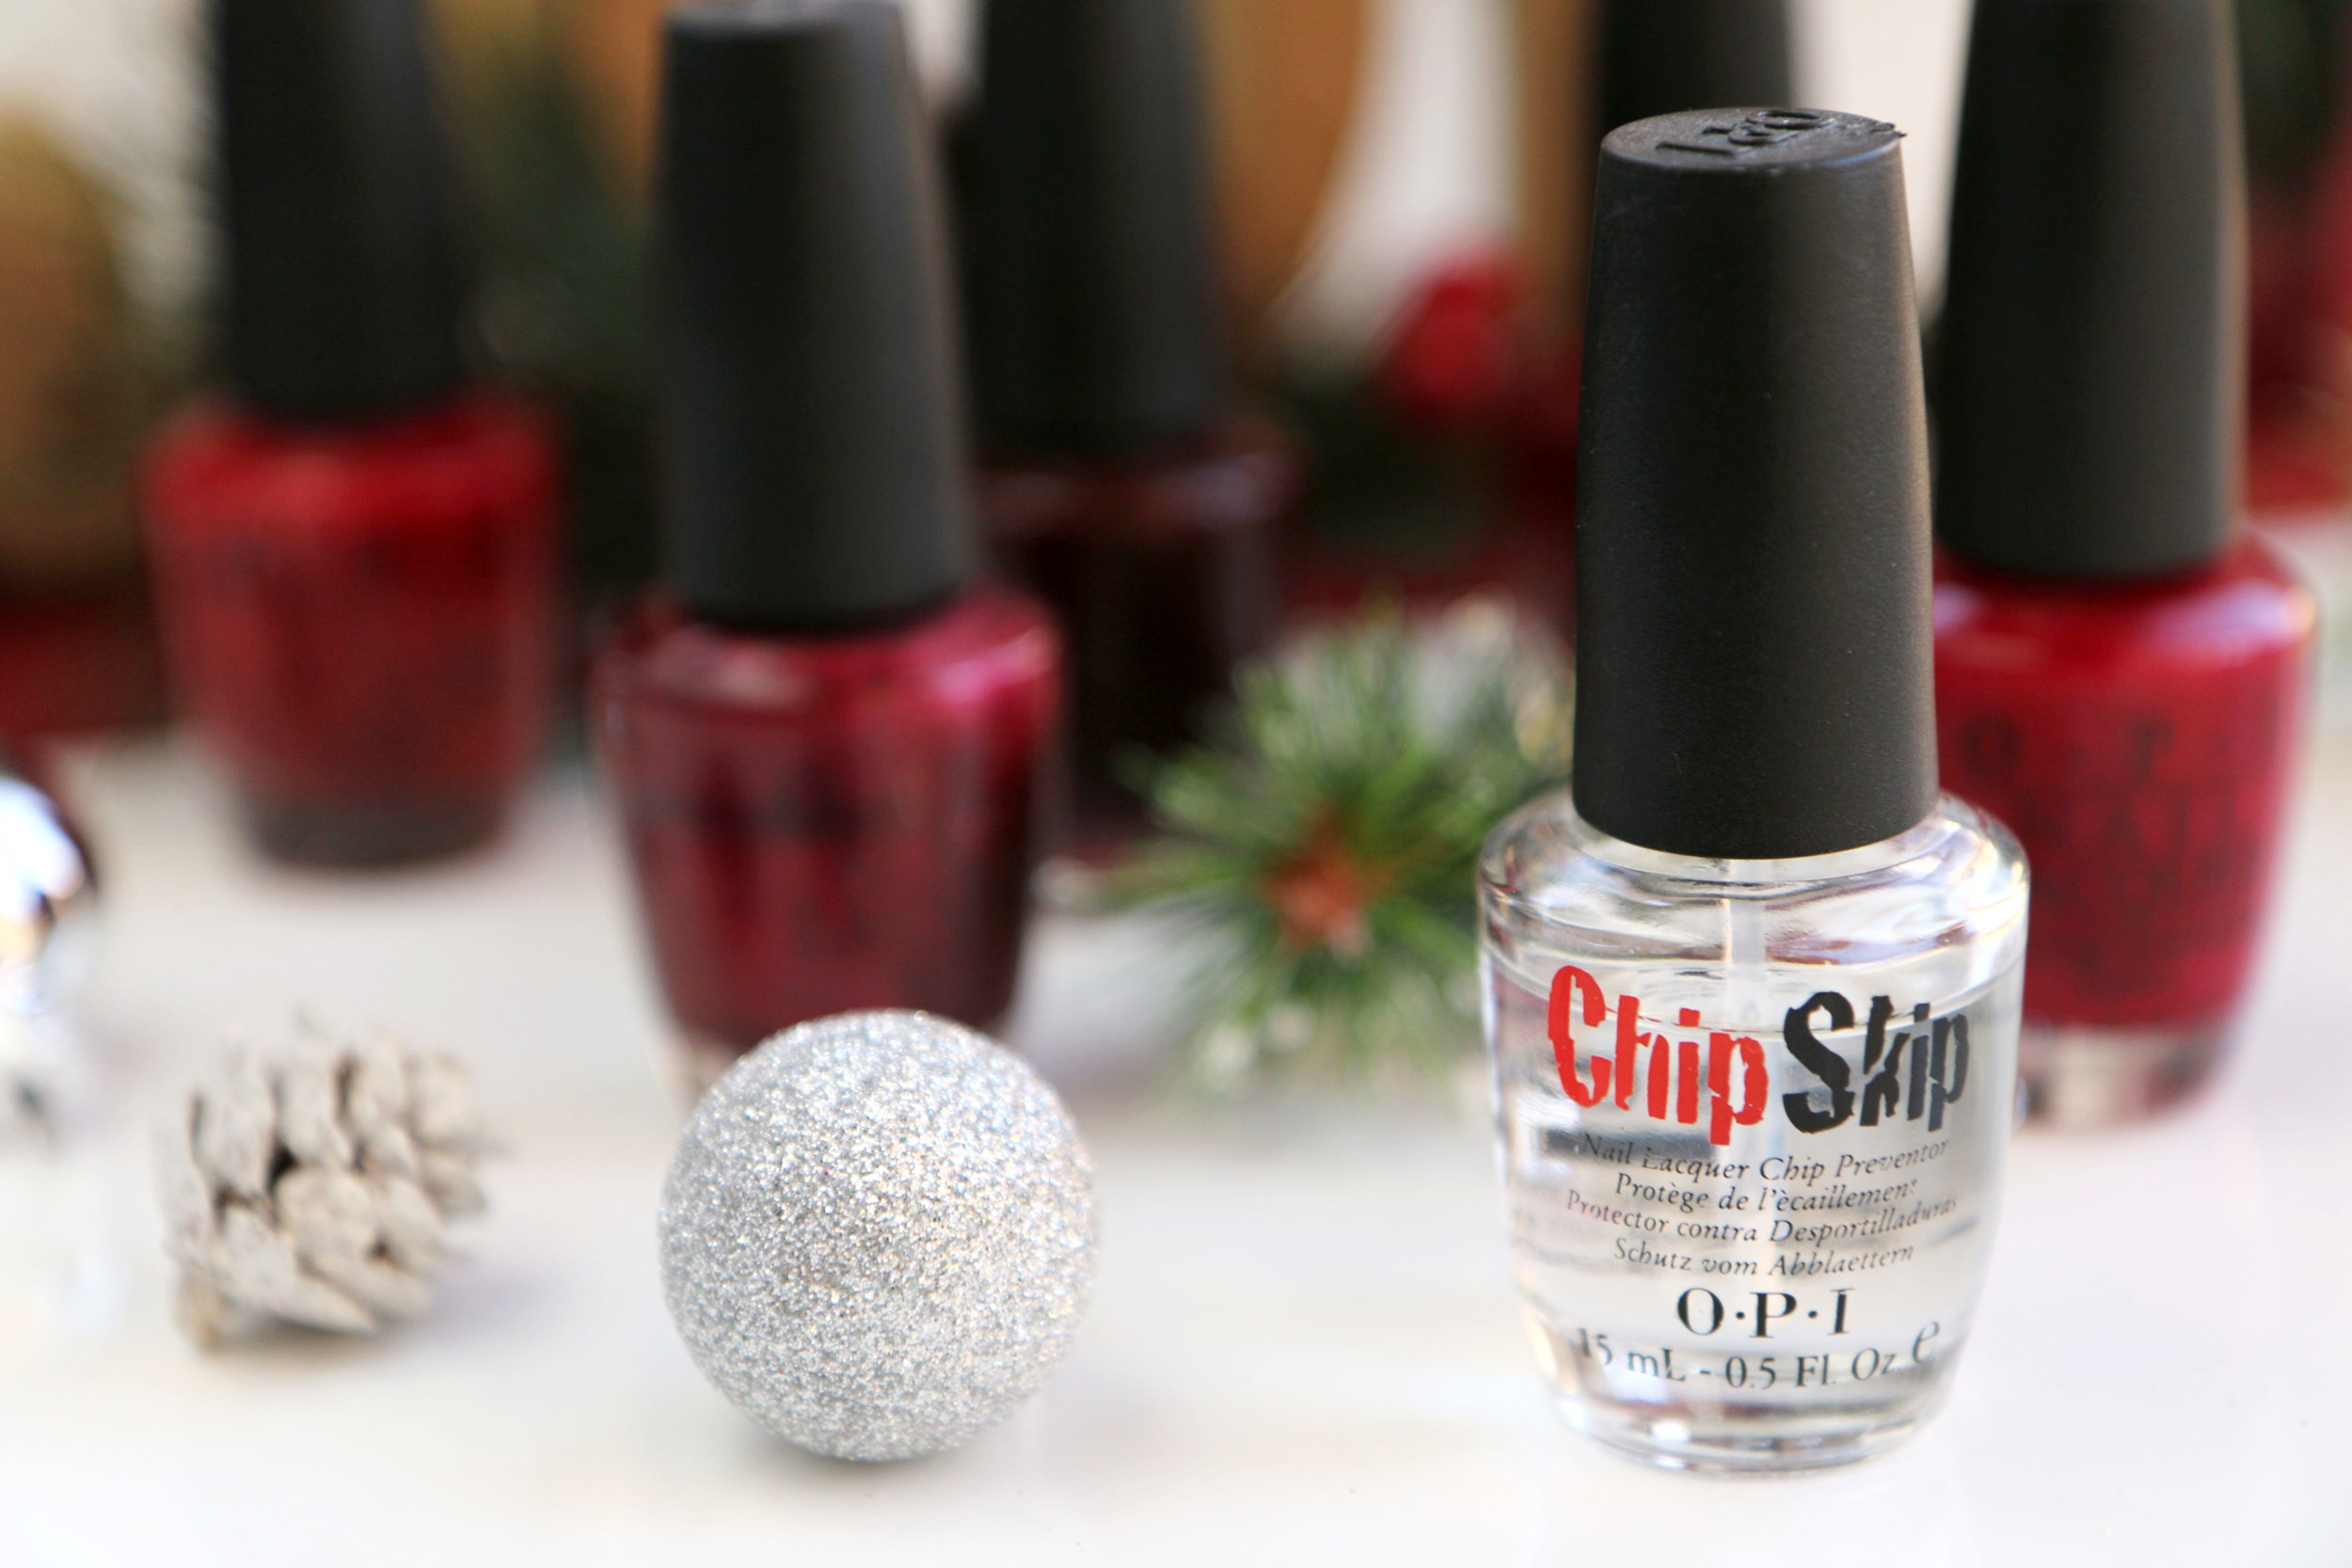 Christmas Red and Chip Skip OPI Nail Polish